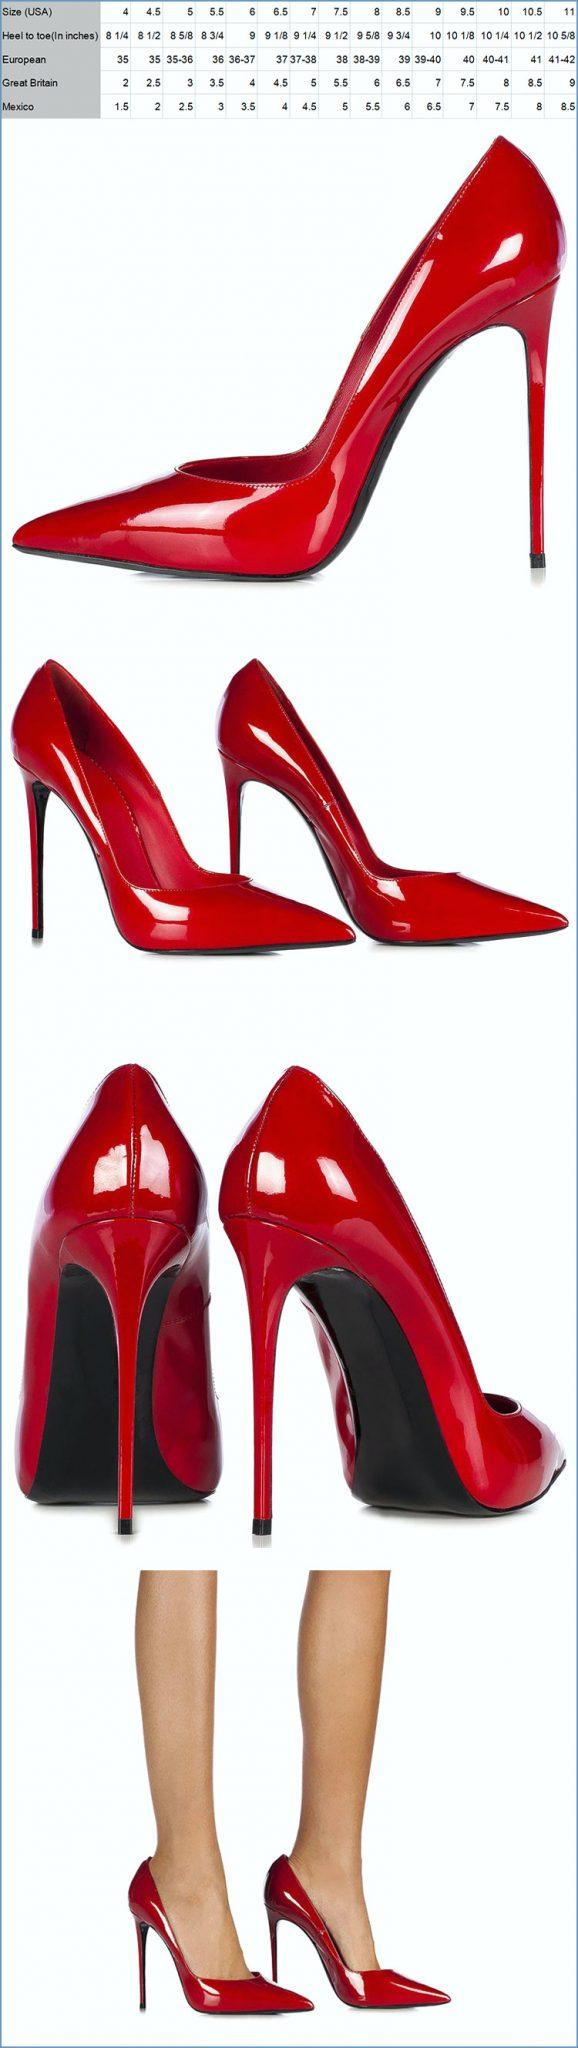 2020 popular new style 12cm red thin high heels la s shoes dari Sepatu High Heels Wanita